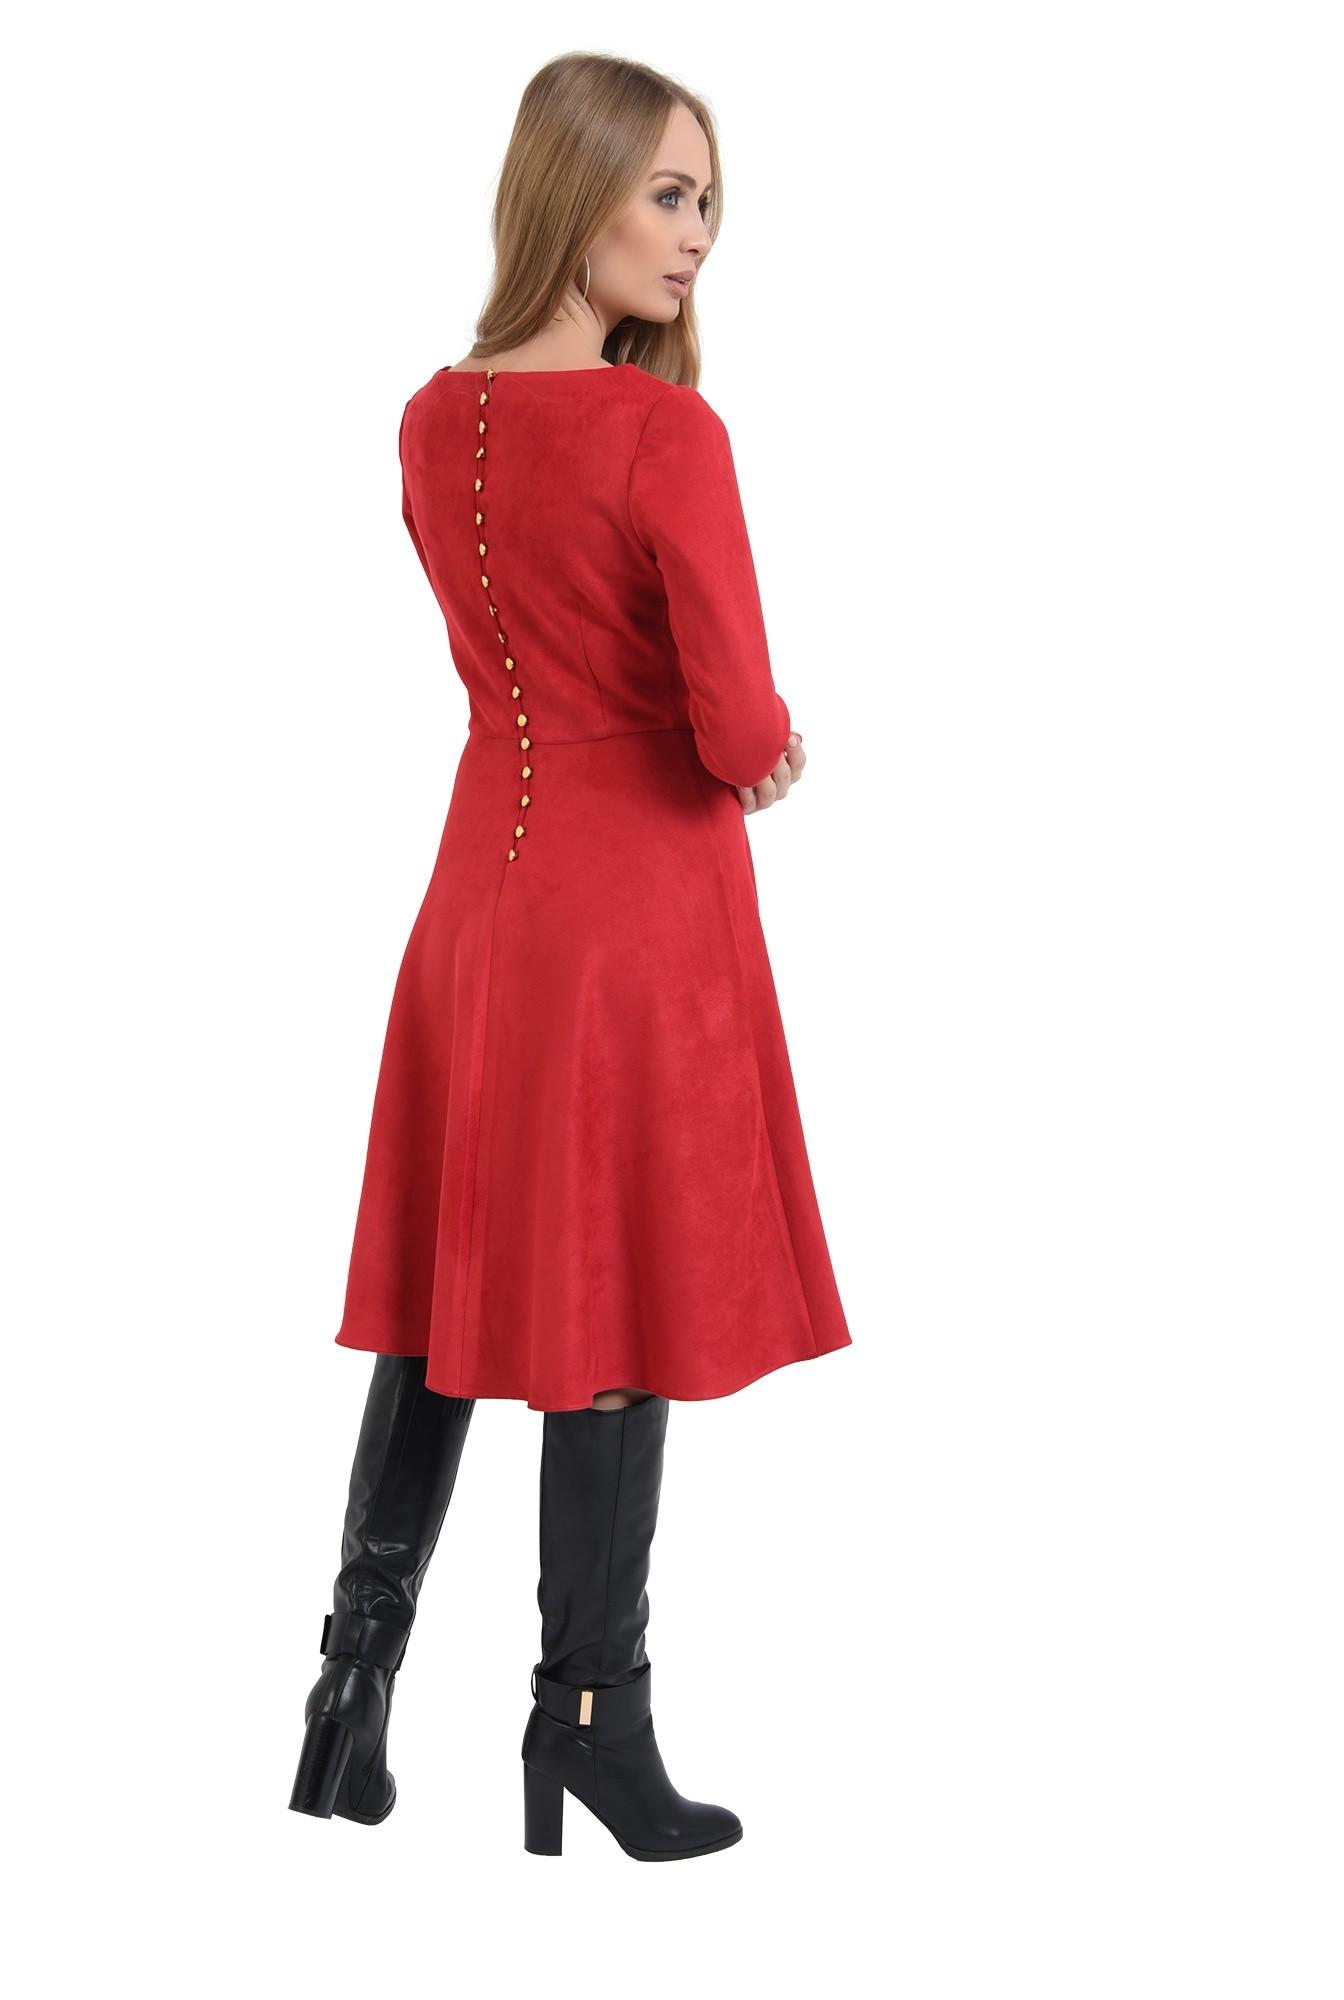 3 - rochie rosie, cu nasturi metalici la spate, evazata